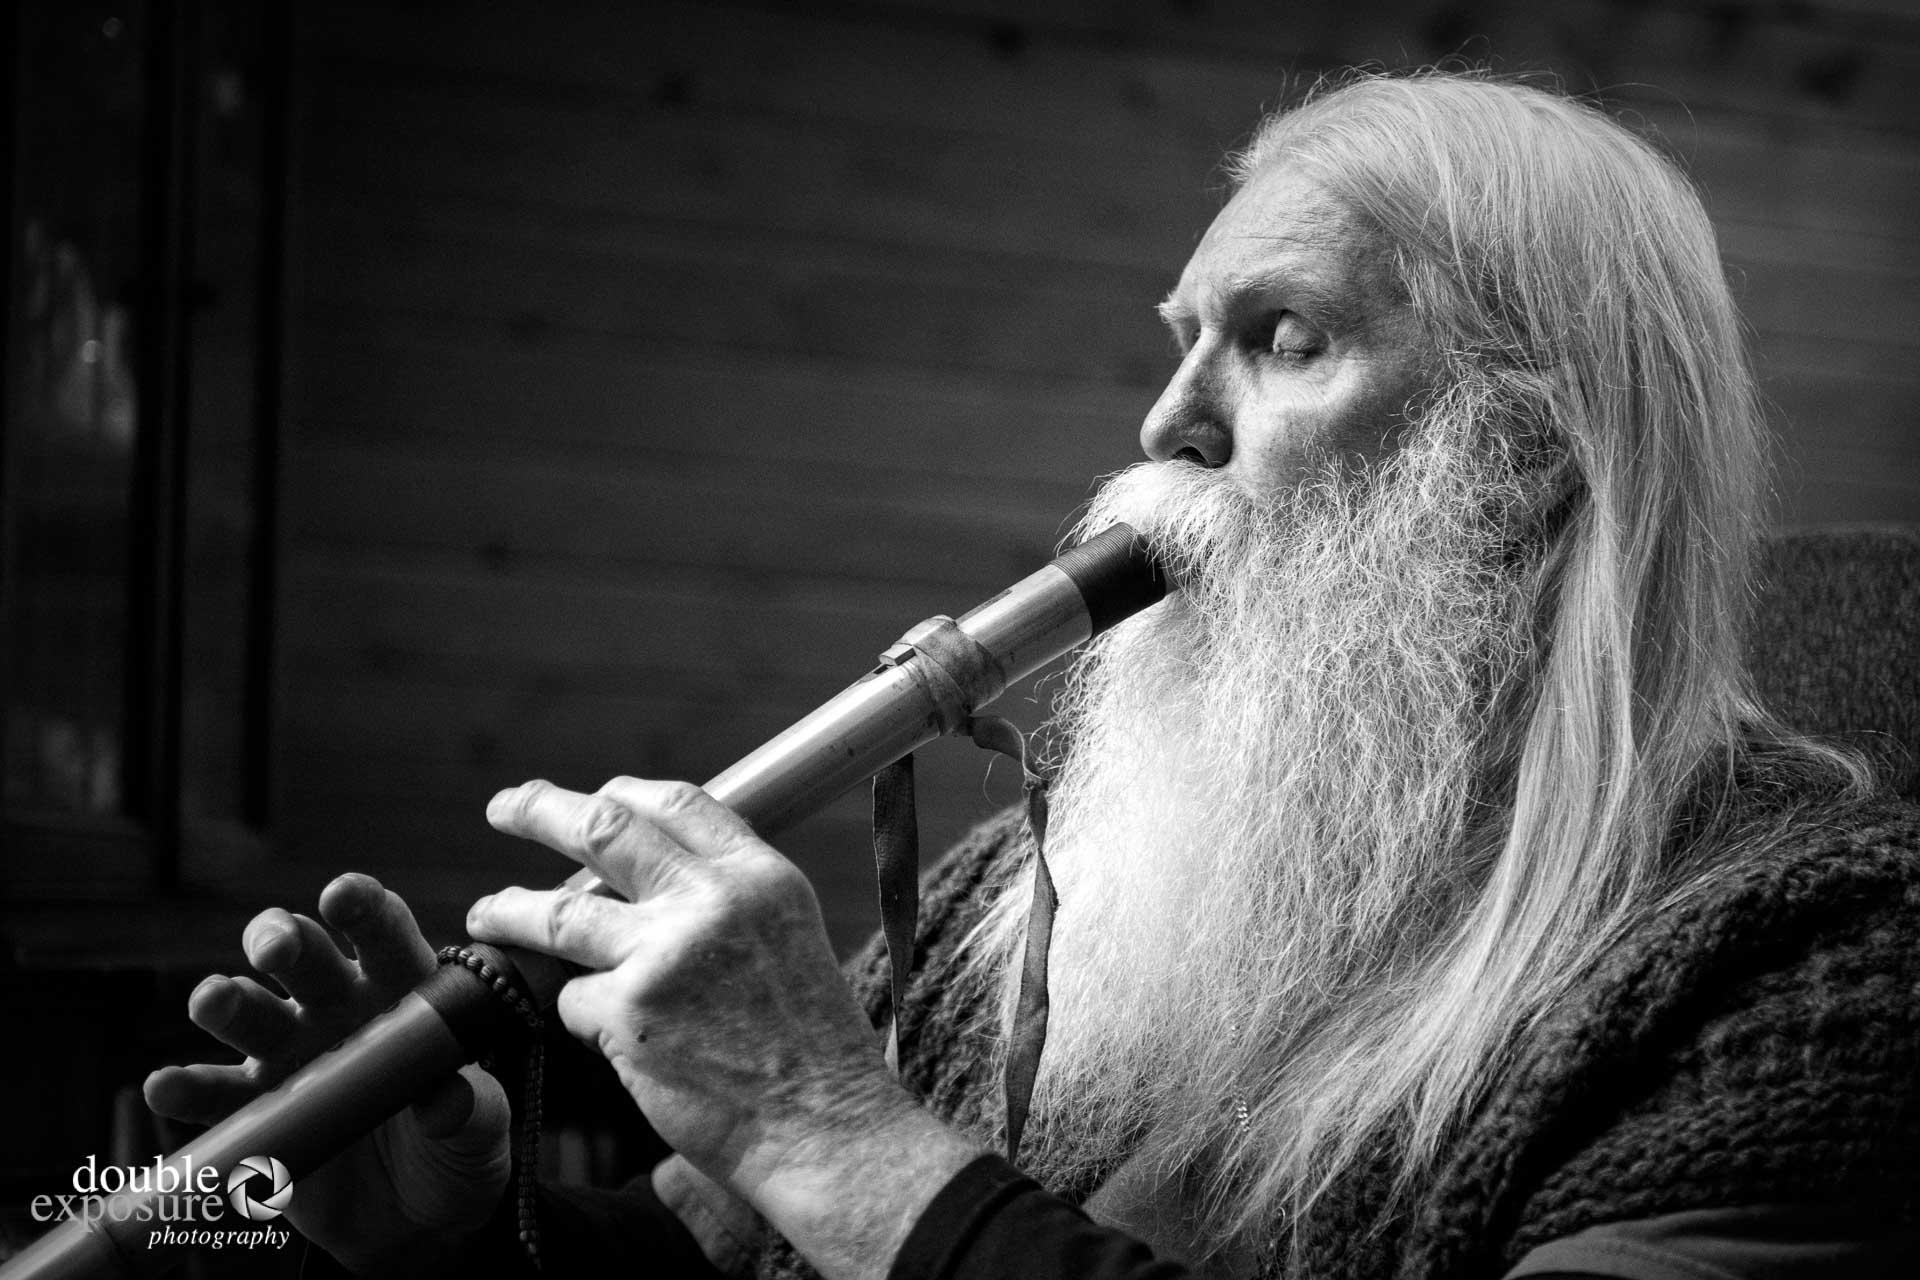 man plays flute